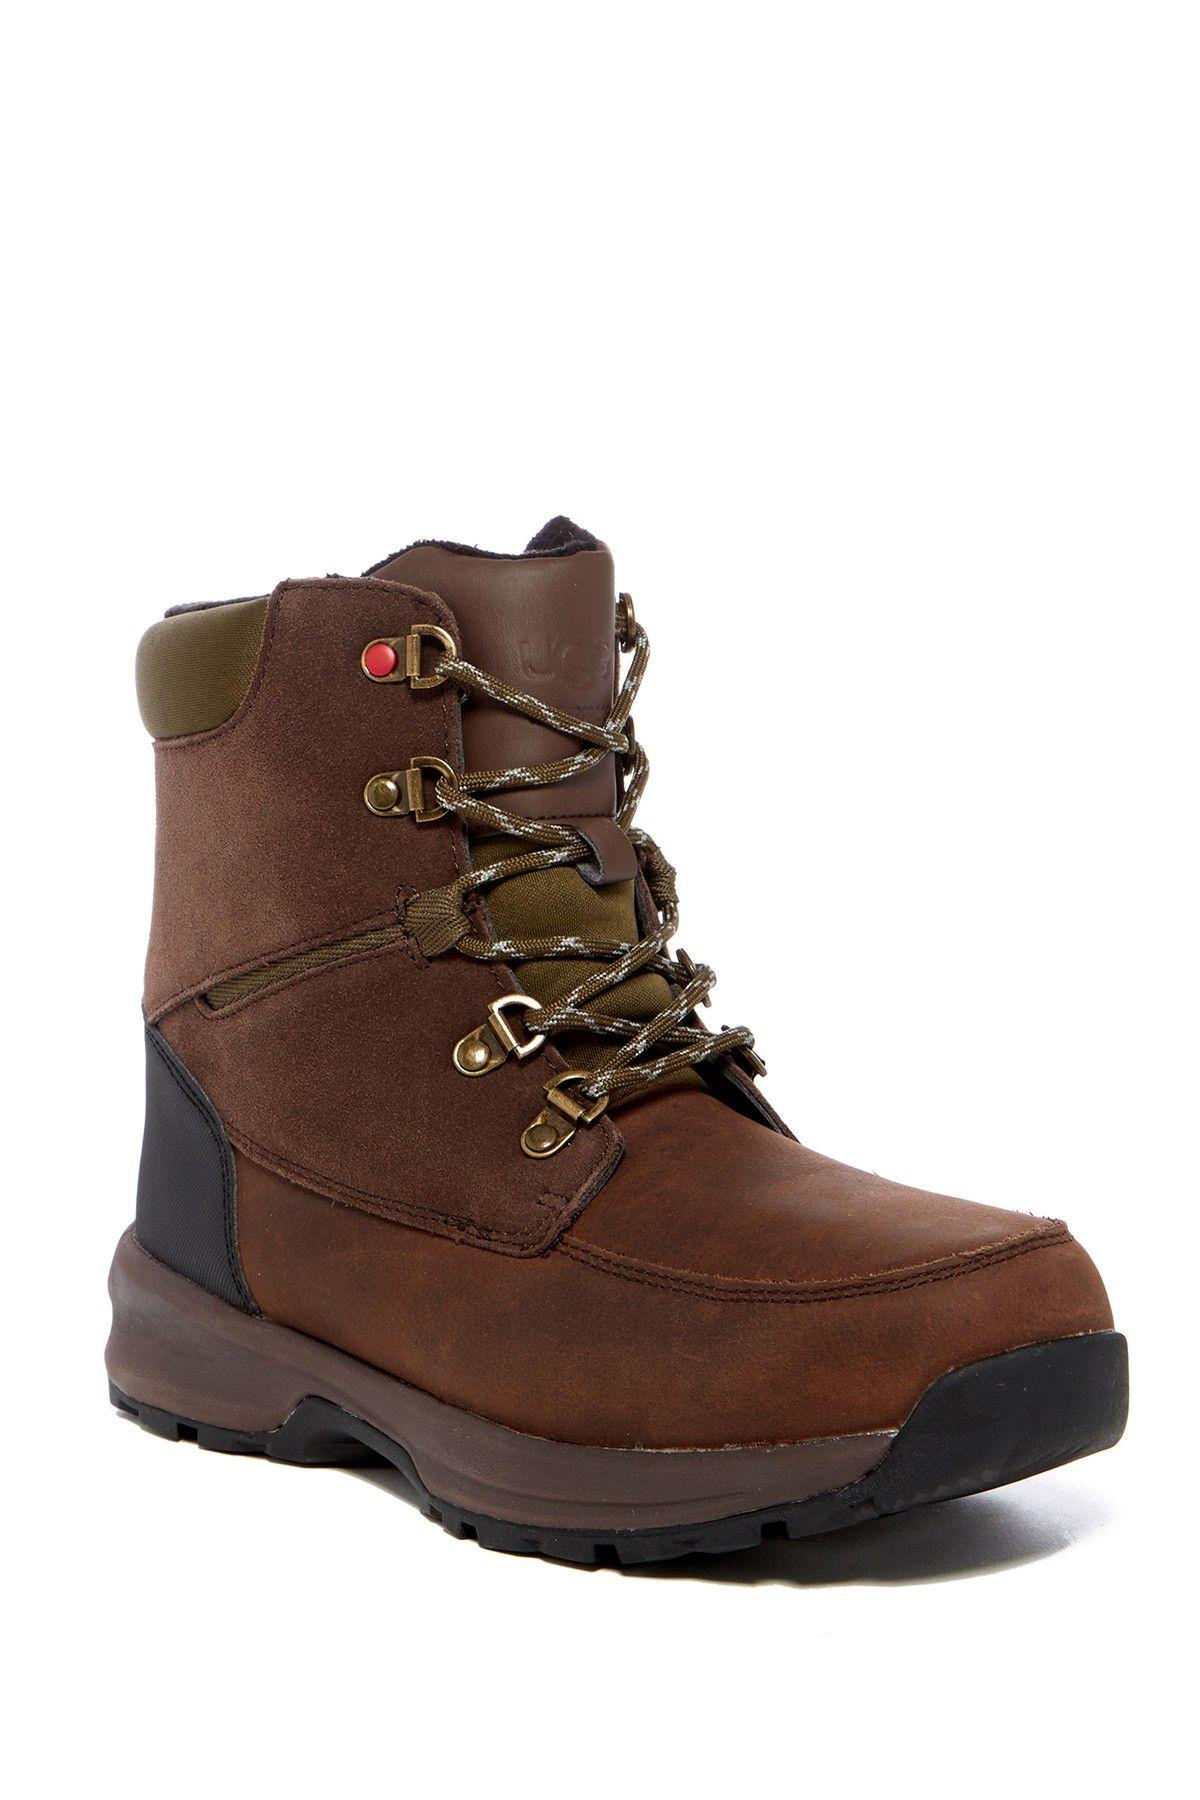 UGG Graupel Leather Waterproof Rain Boot Boots, Mens